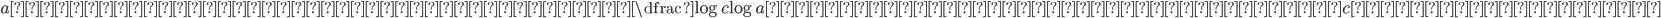 aが有理数の有理数乗でない時は\dfrac{\log{c}}{\log{a}}が有理数となるような有理数cは存在しない。